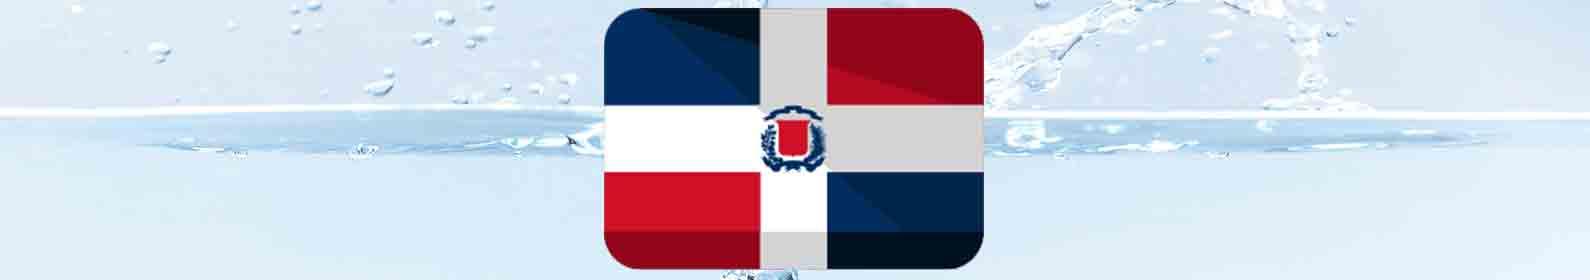 water-treatment-dominican-republic.jpg